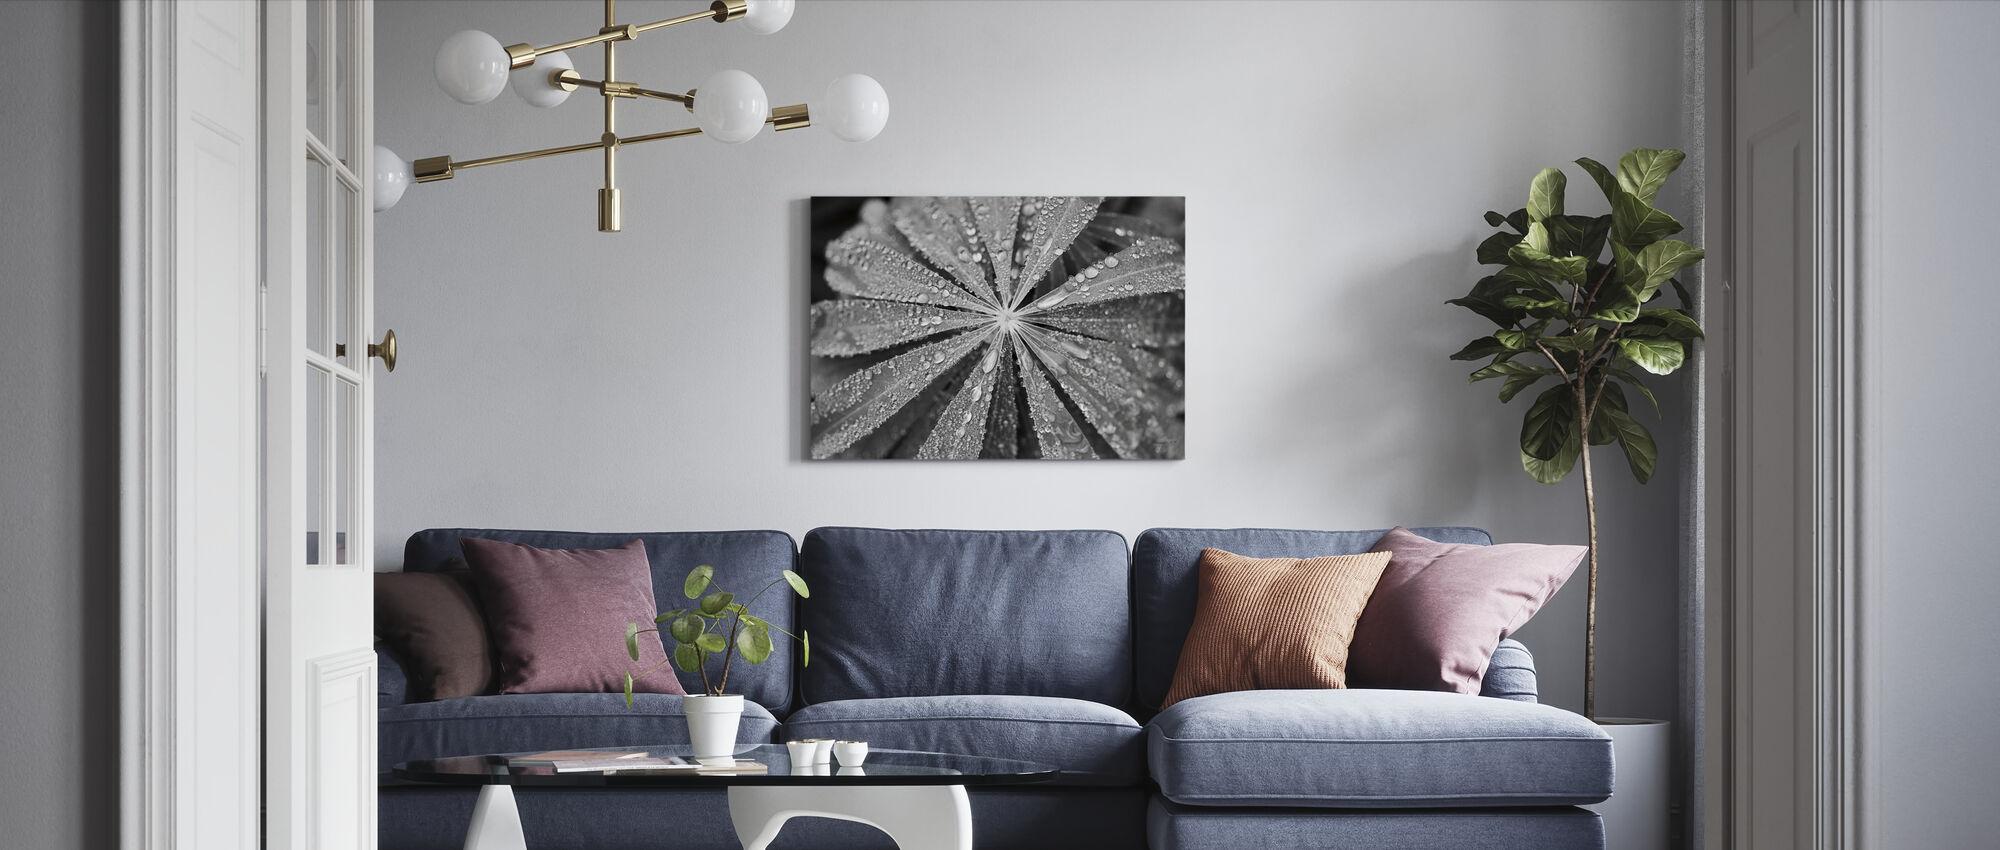 Raindrops on Lupine - Canvas print - Living Room